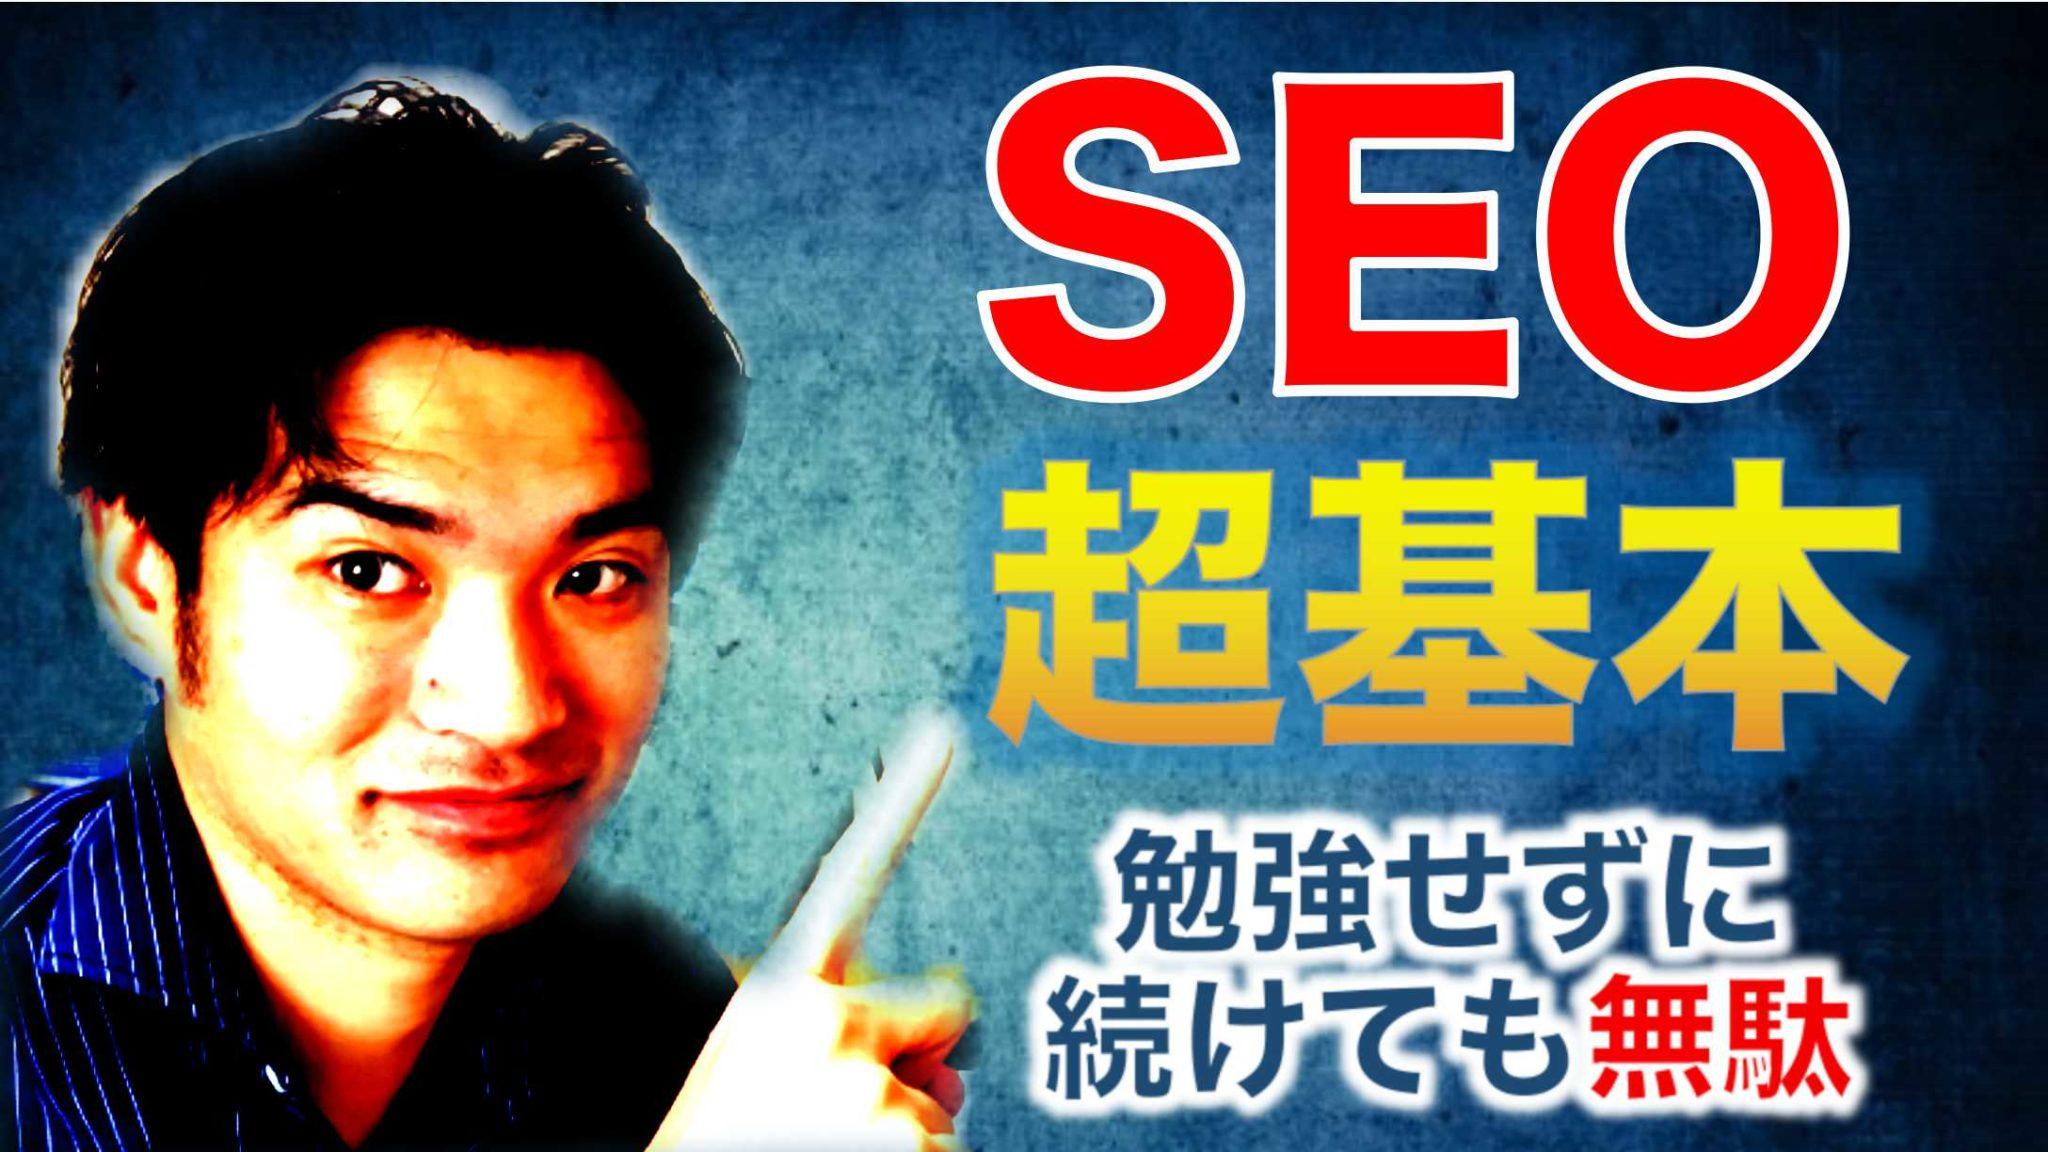 SEOの基礎を丁寧にわかりやすく解説【SEOをちゃんと勉強せずにブログ続けても無駄です】